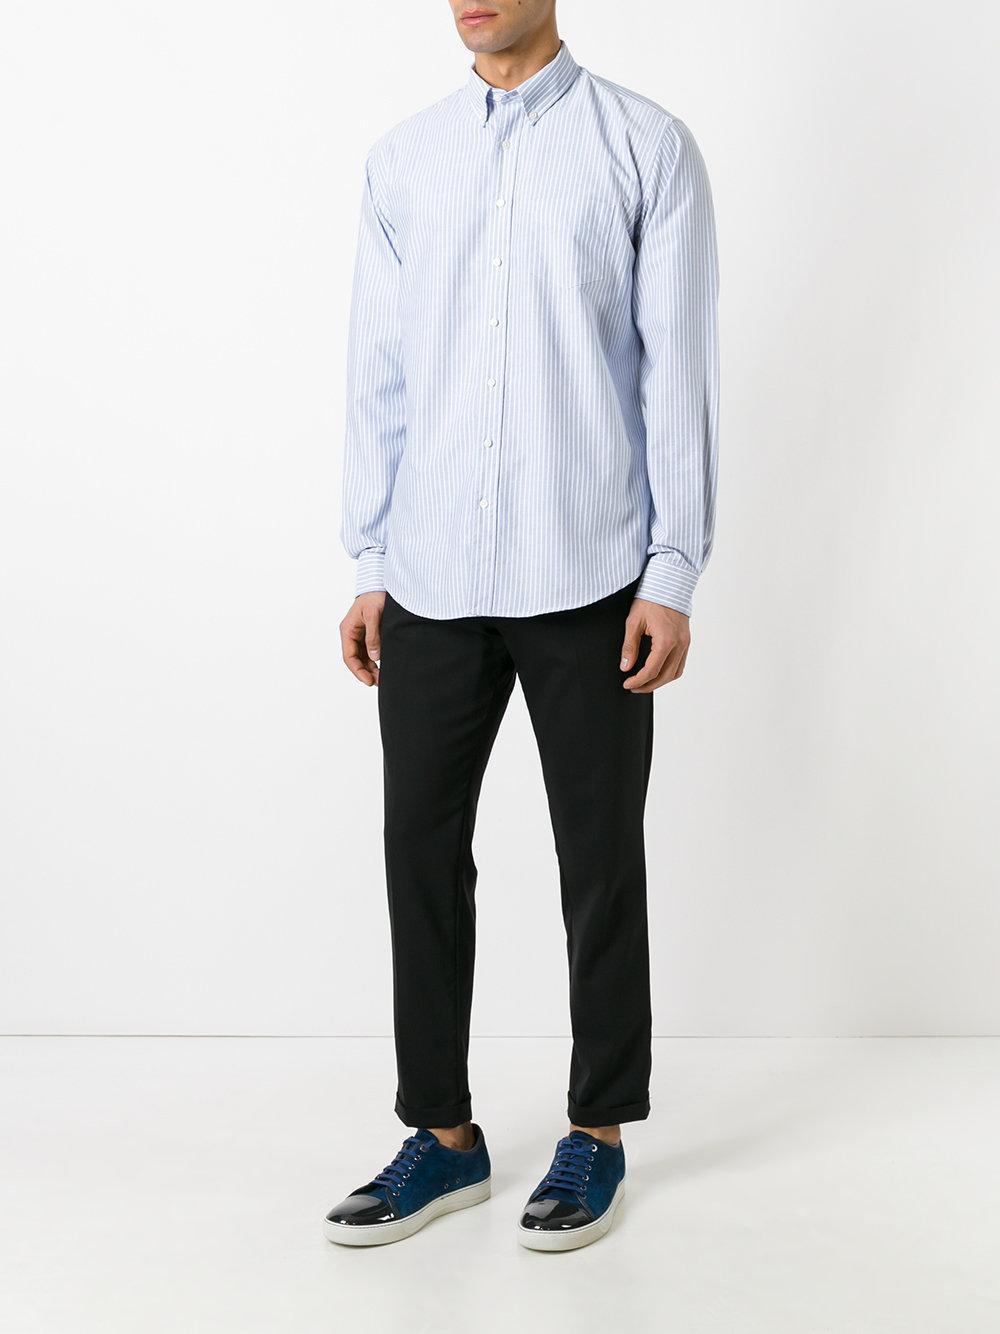 Schnayderman's Cotton Striped Shirt in Blue for Men